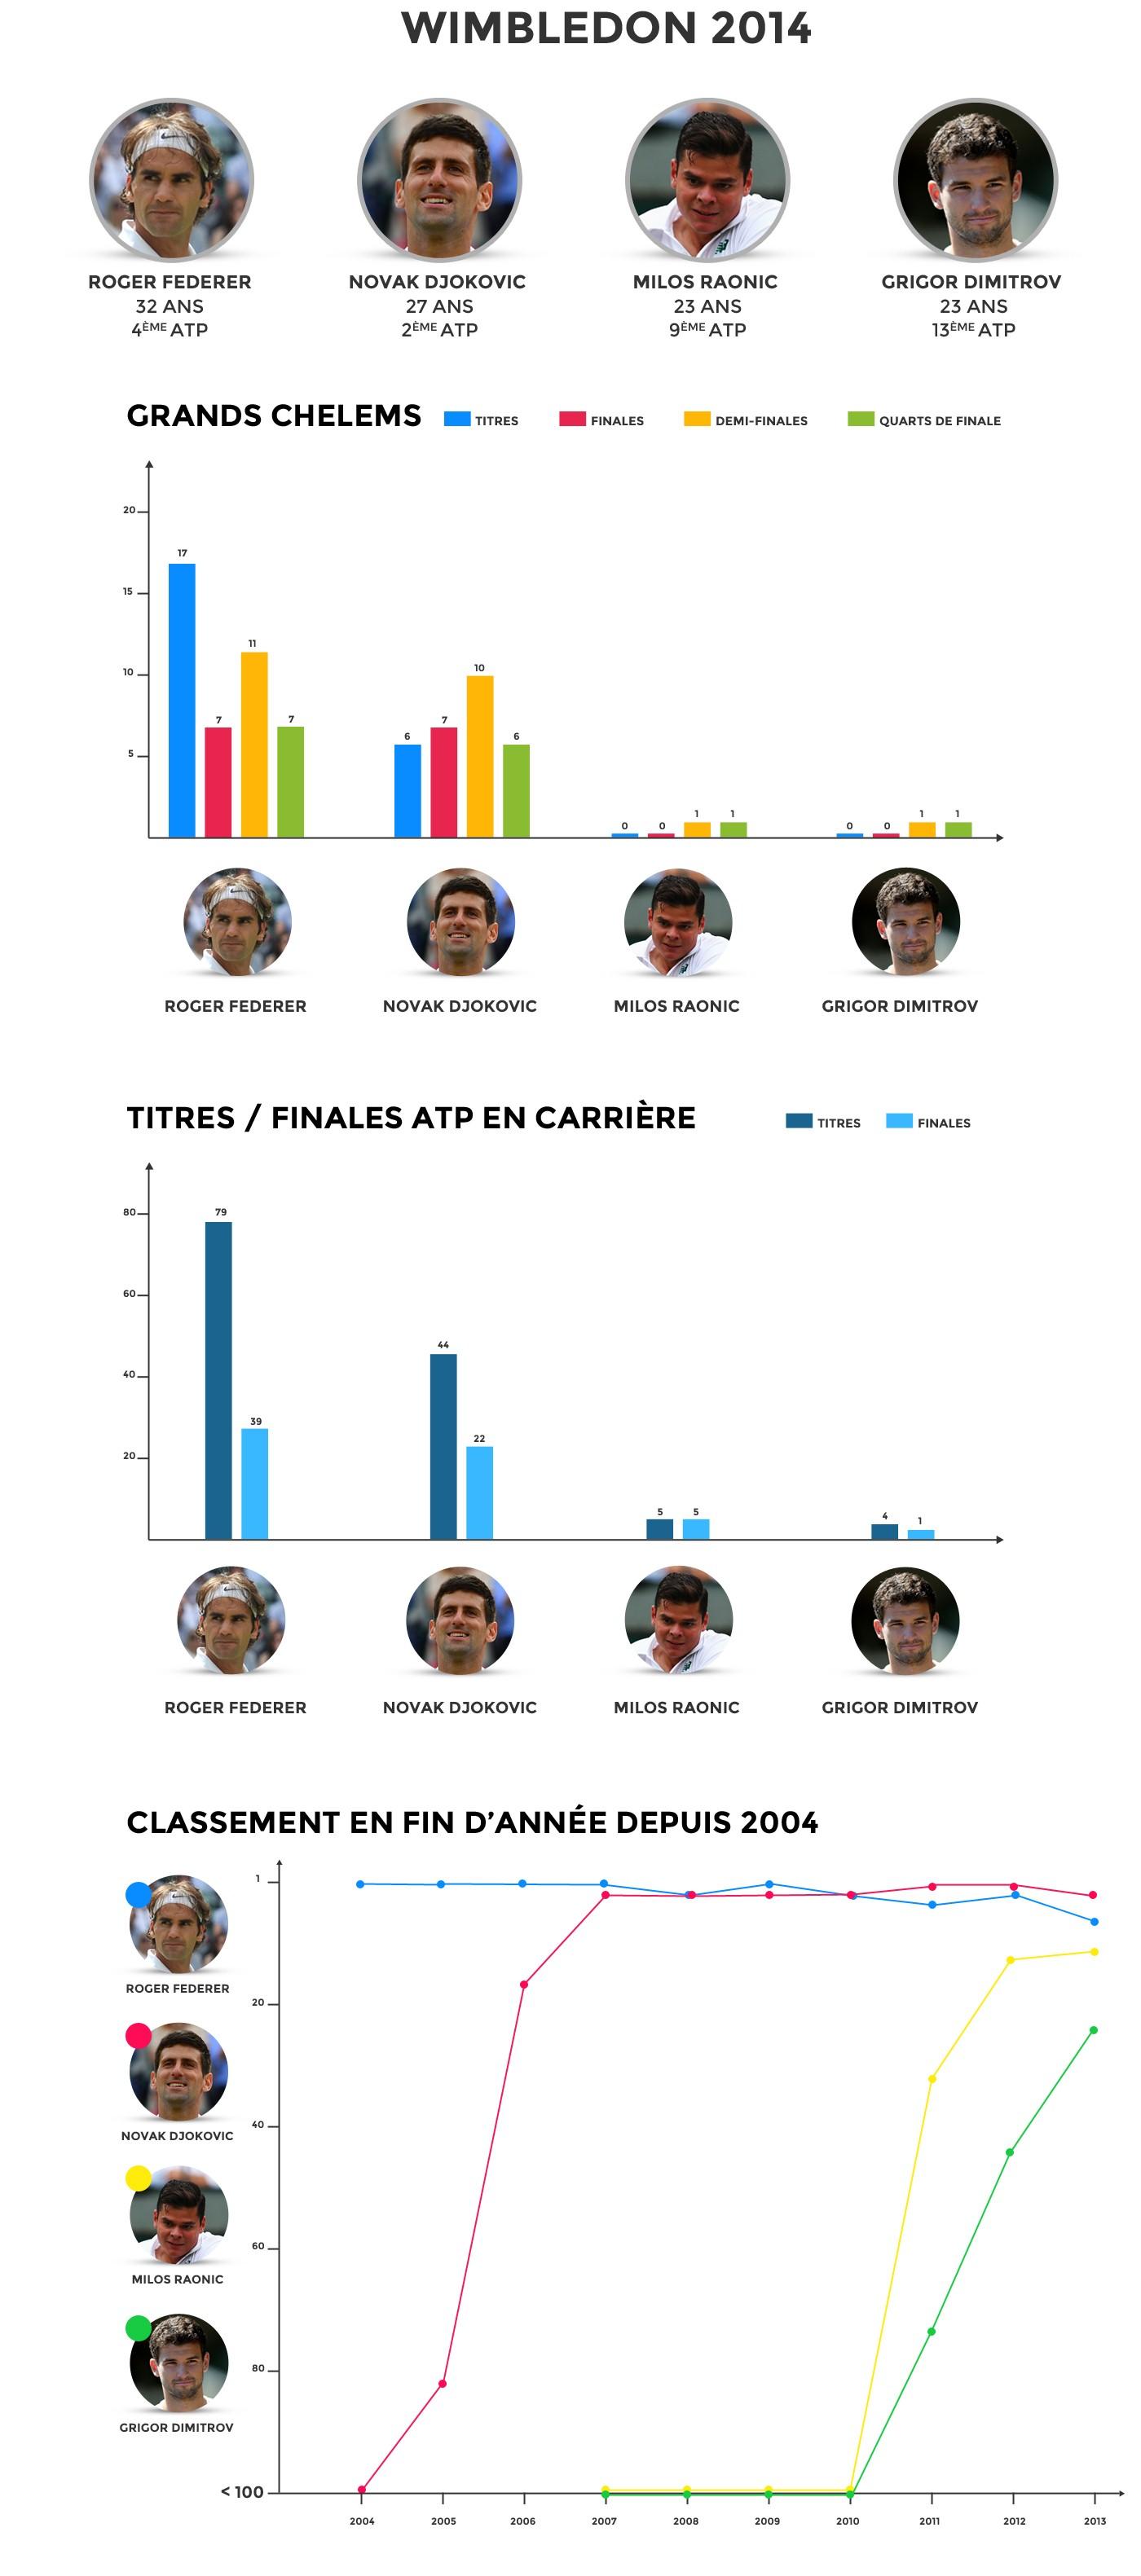 Infographie Wimbledon 2014 Federer, Djokovic, Raonic, Dimitrov